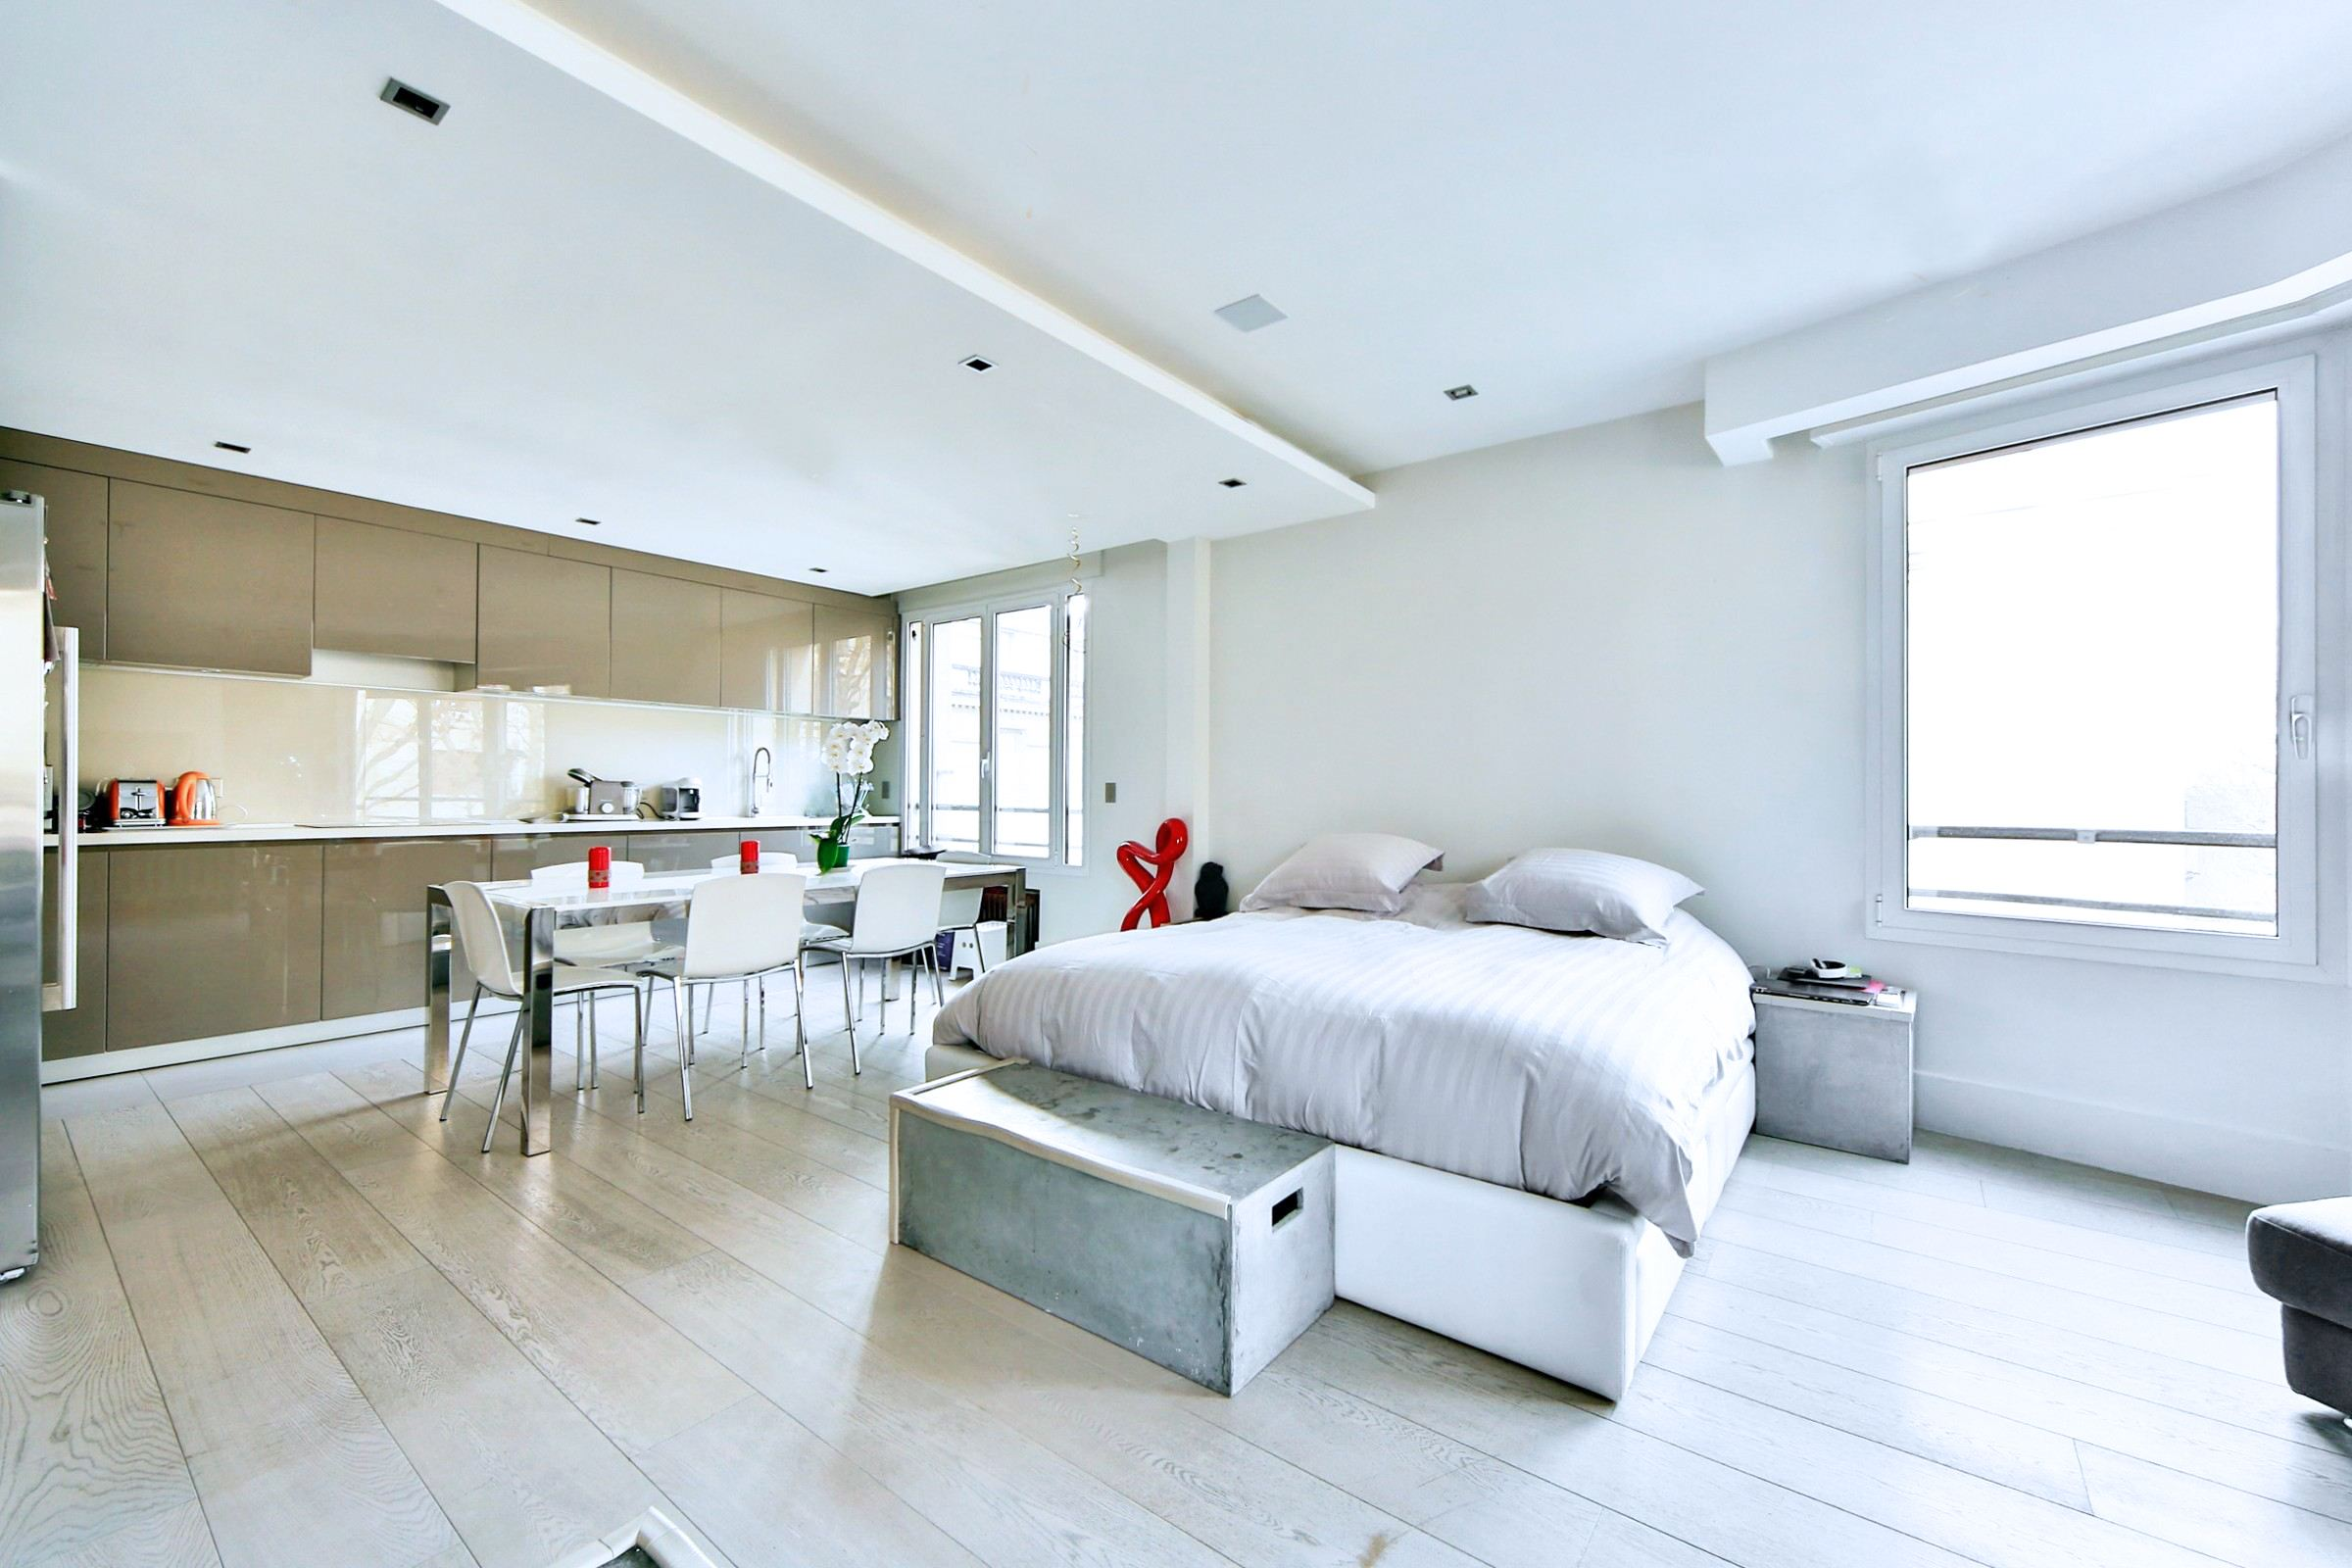 Apartamento por un Venta en Paris 16 - Muette - Apartment fully renovated Paris, Paris 75016 Francia